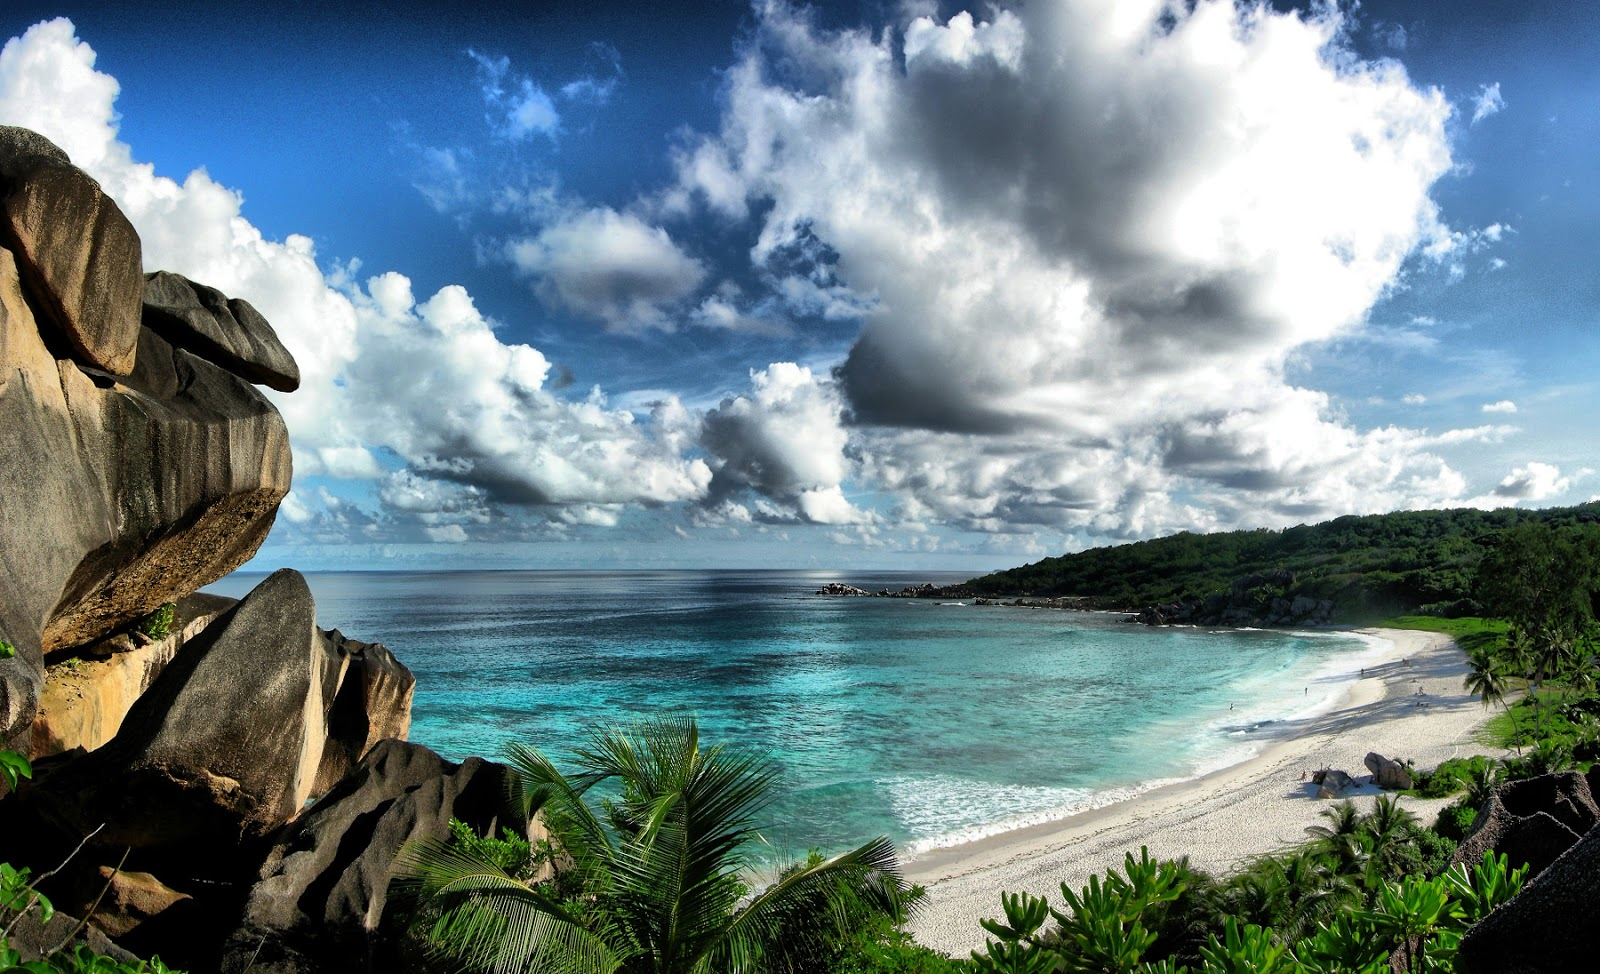 Seychelles Islands - Seychelles Tourist Attractions ...